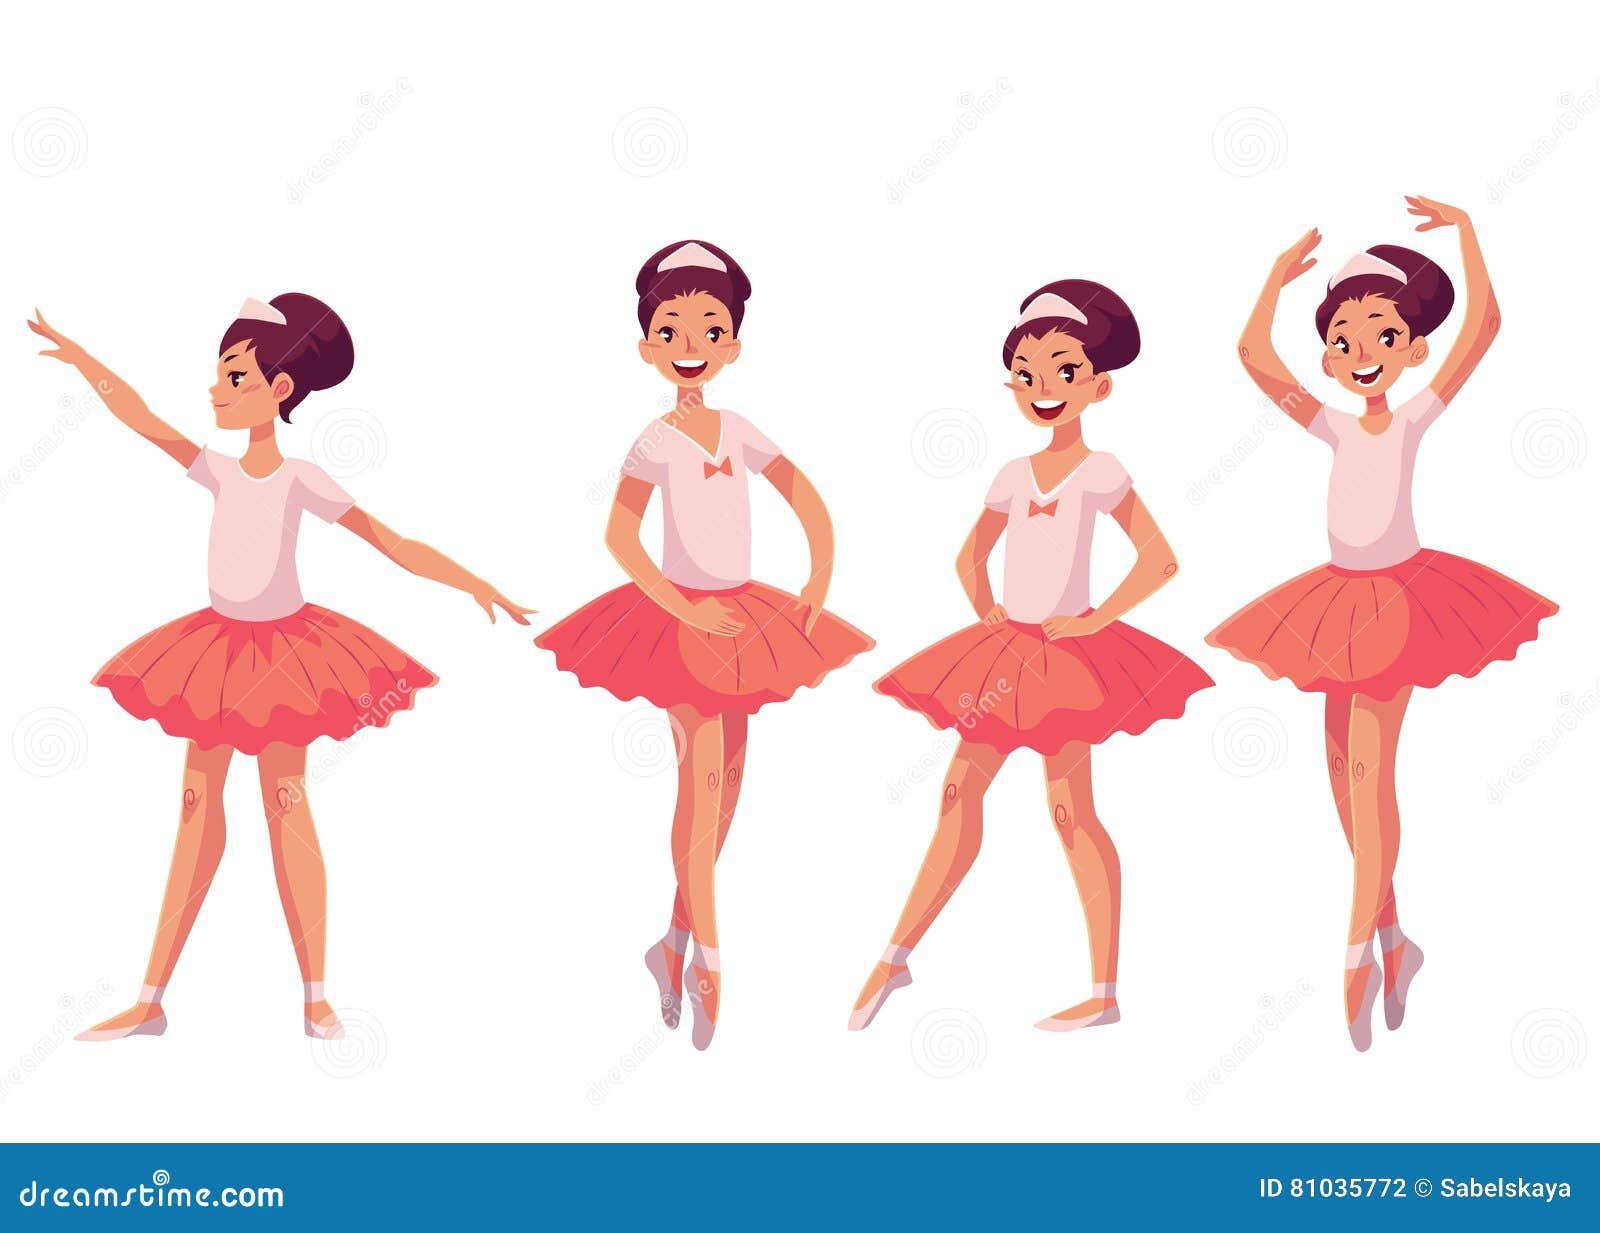 29352be7d0b Χαριτωμένο αρκετά νέο ballerina στο ρόδινο tutu, διανυσματικές απεικονίσεις  ύφους κινούμενων σχεδίων στο άσπρο υπόβαθρο Λίγος χορευτής μπαλέτου στο  ρόδινο ...